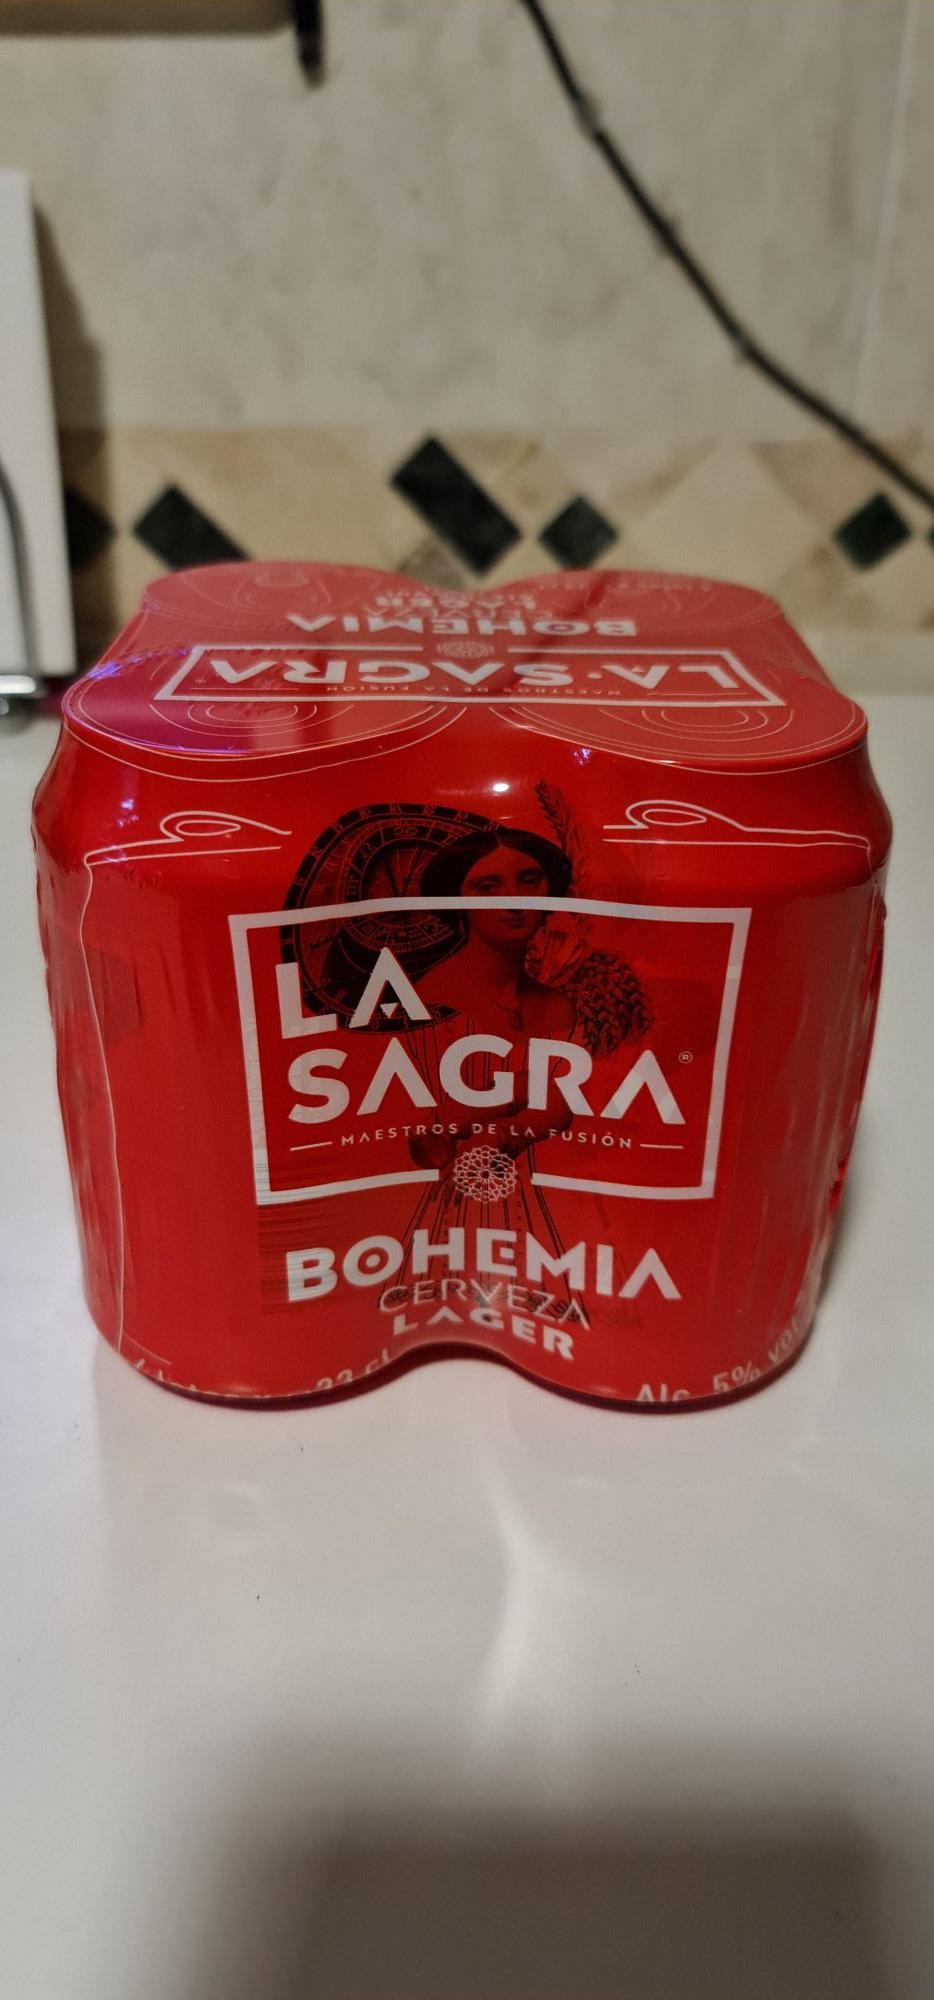 La Sagra Bohemia Pack 4 cervezas (sqrups)